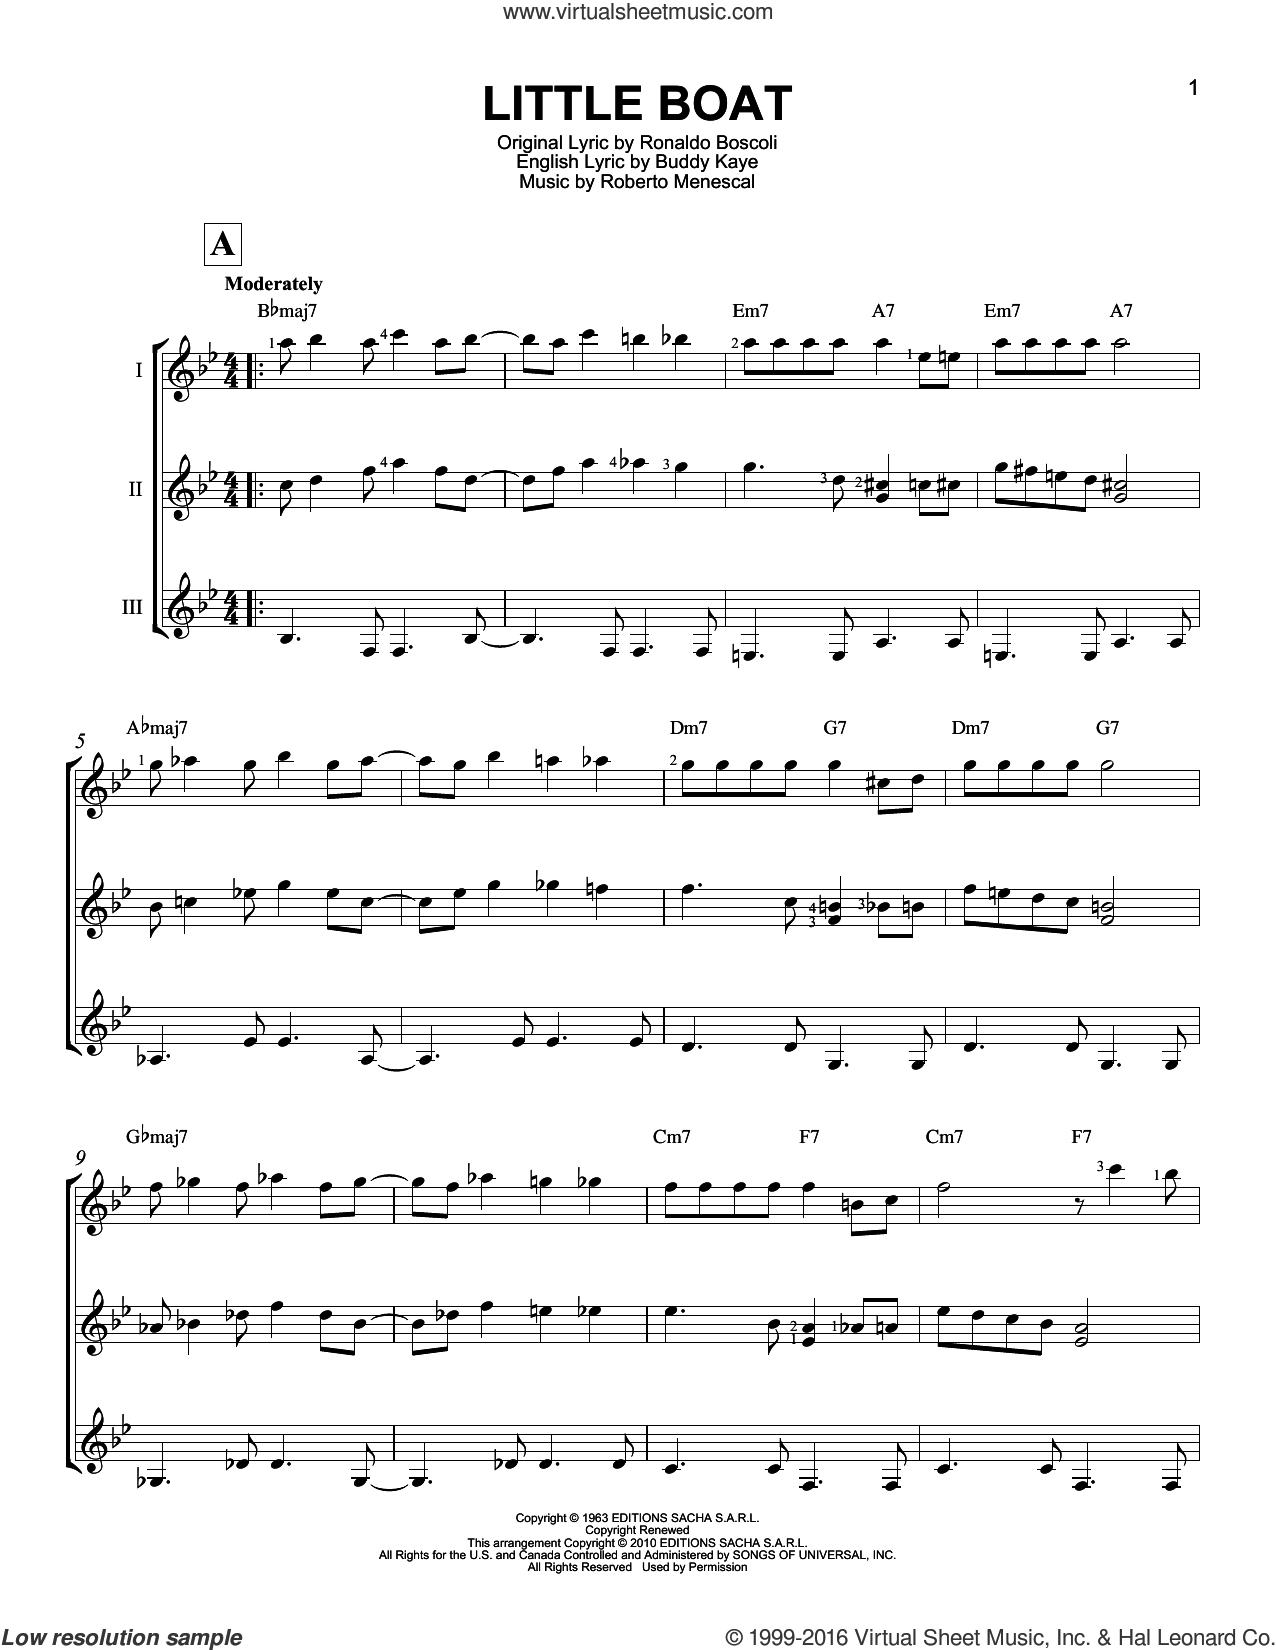 Little Boat (O Barquinho) sheet music for guitar ensemble by Buddy Kaye, Roberto Menescal and Ronaldo Boscoli, intermediate skill level